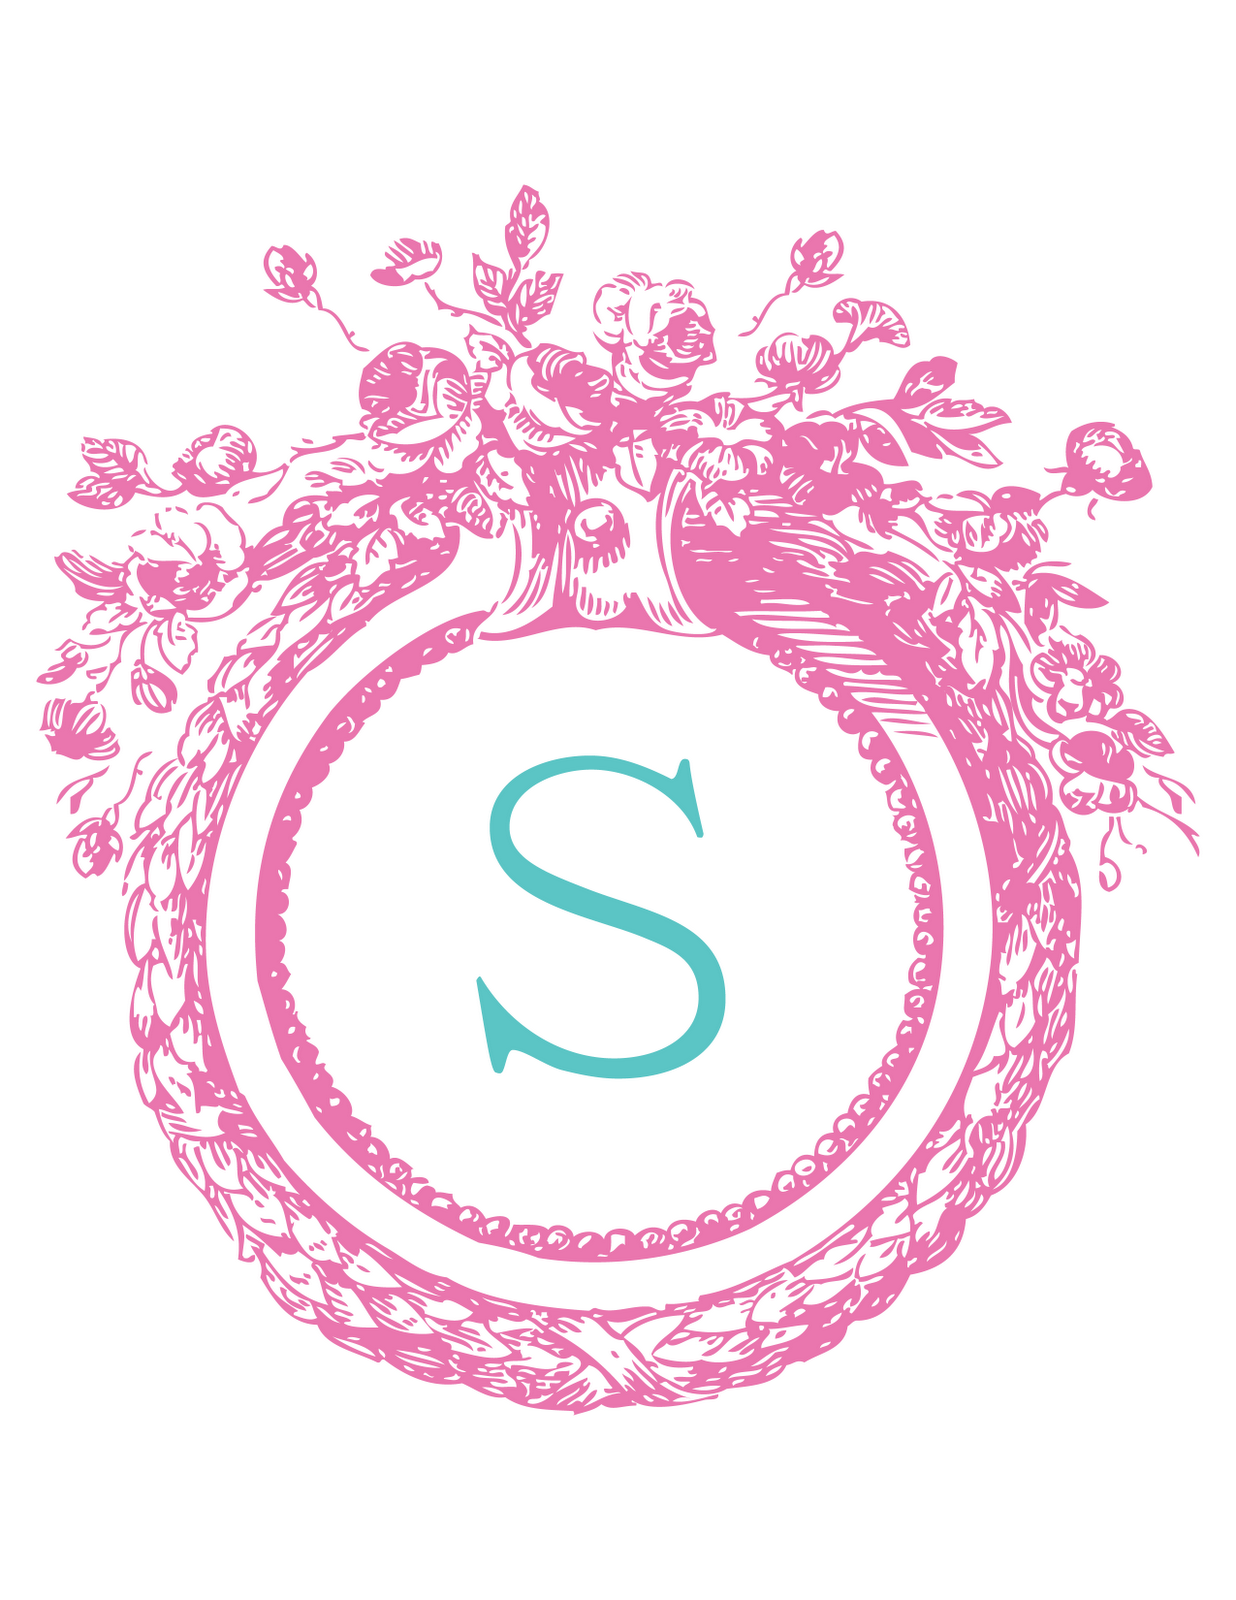 Free Monogram Templates | Free monogram design service from ...